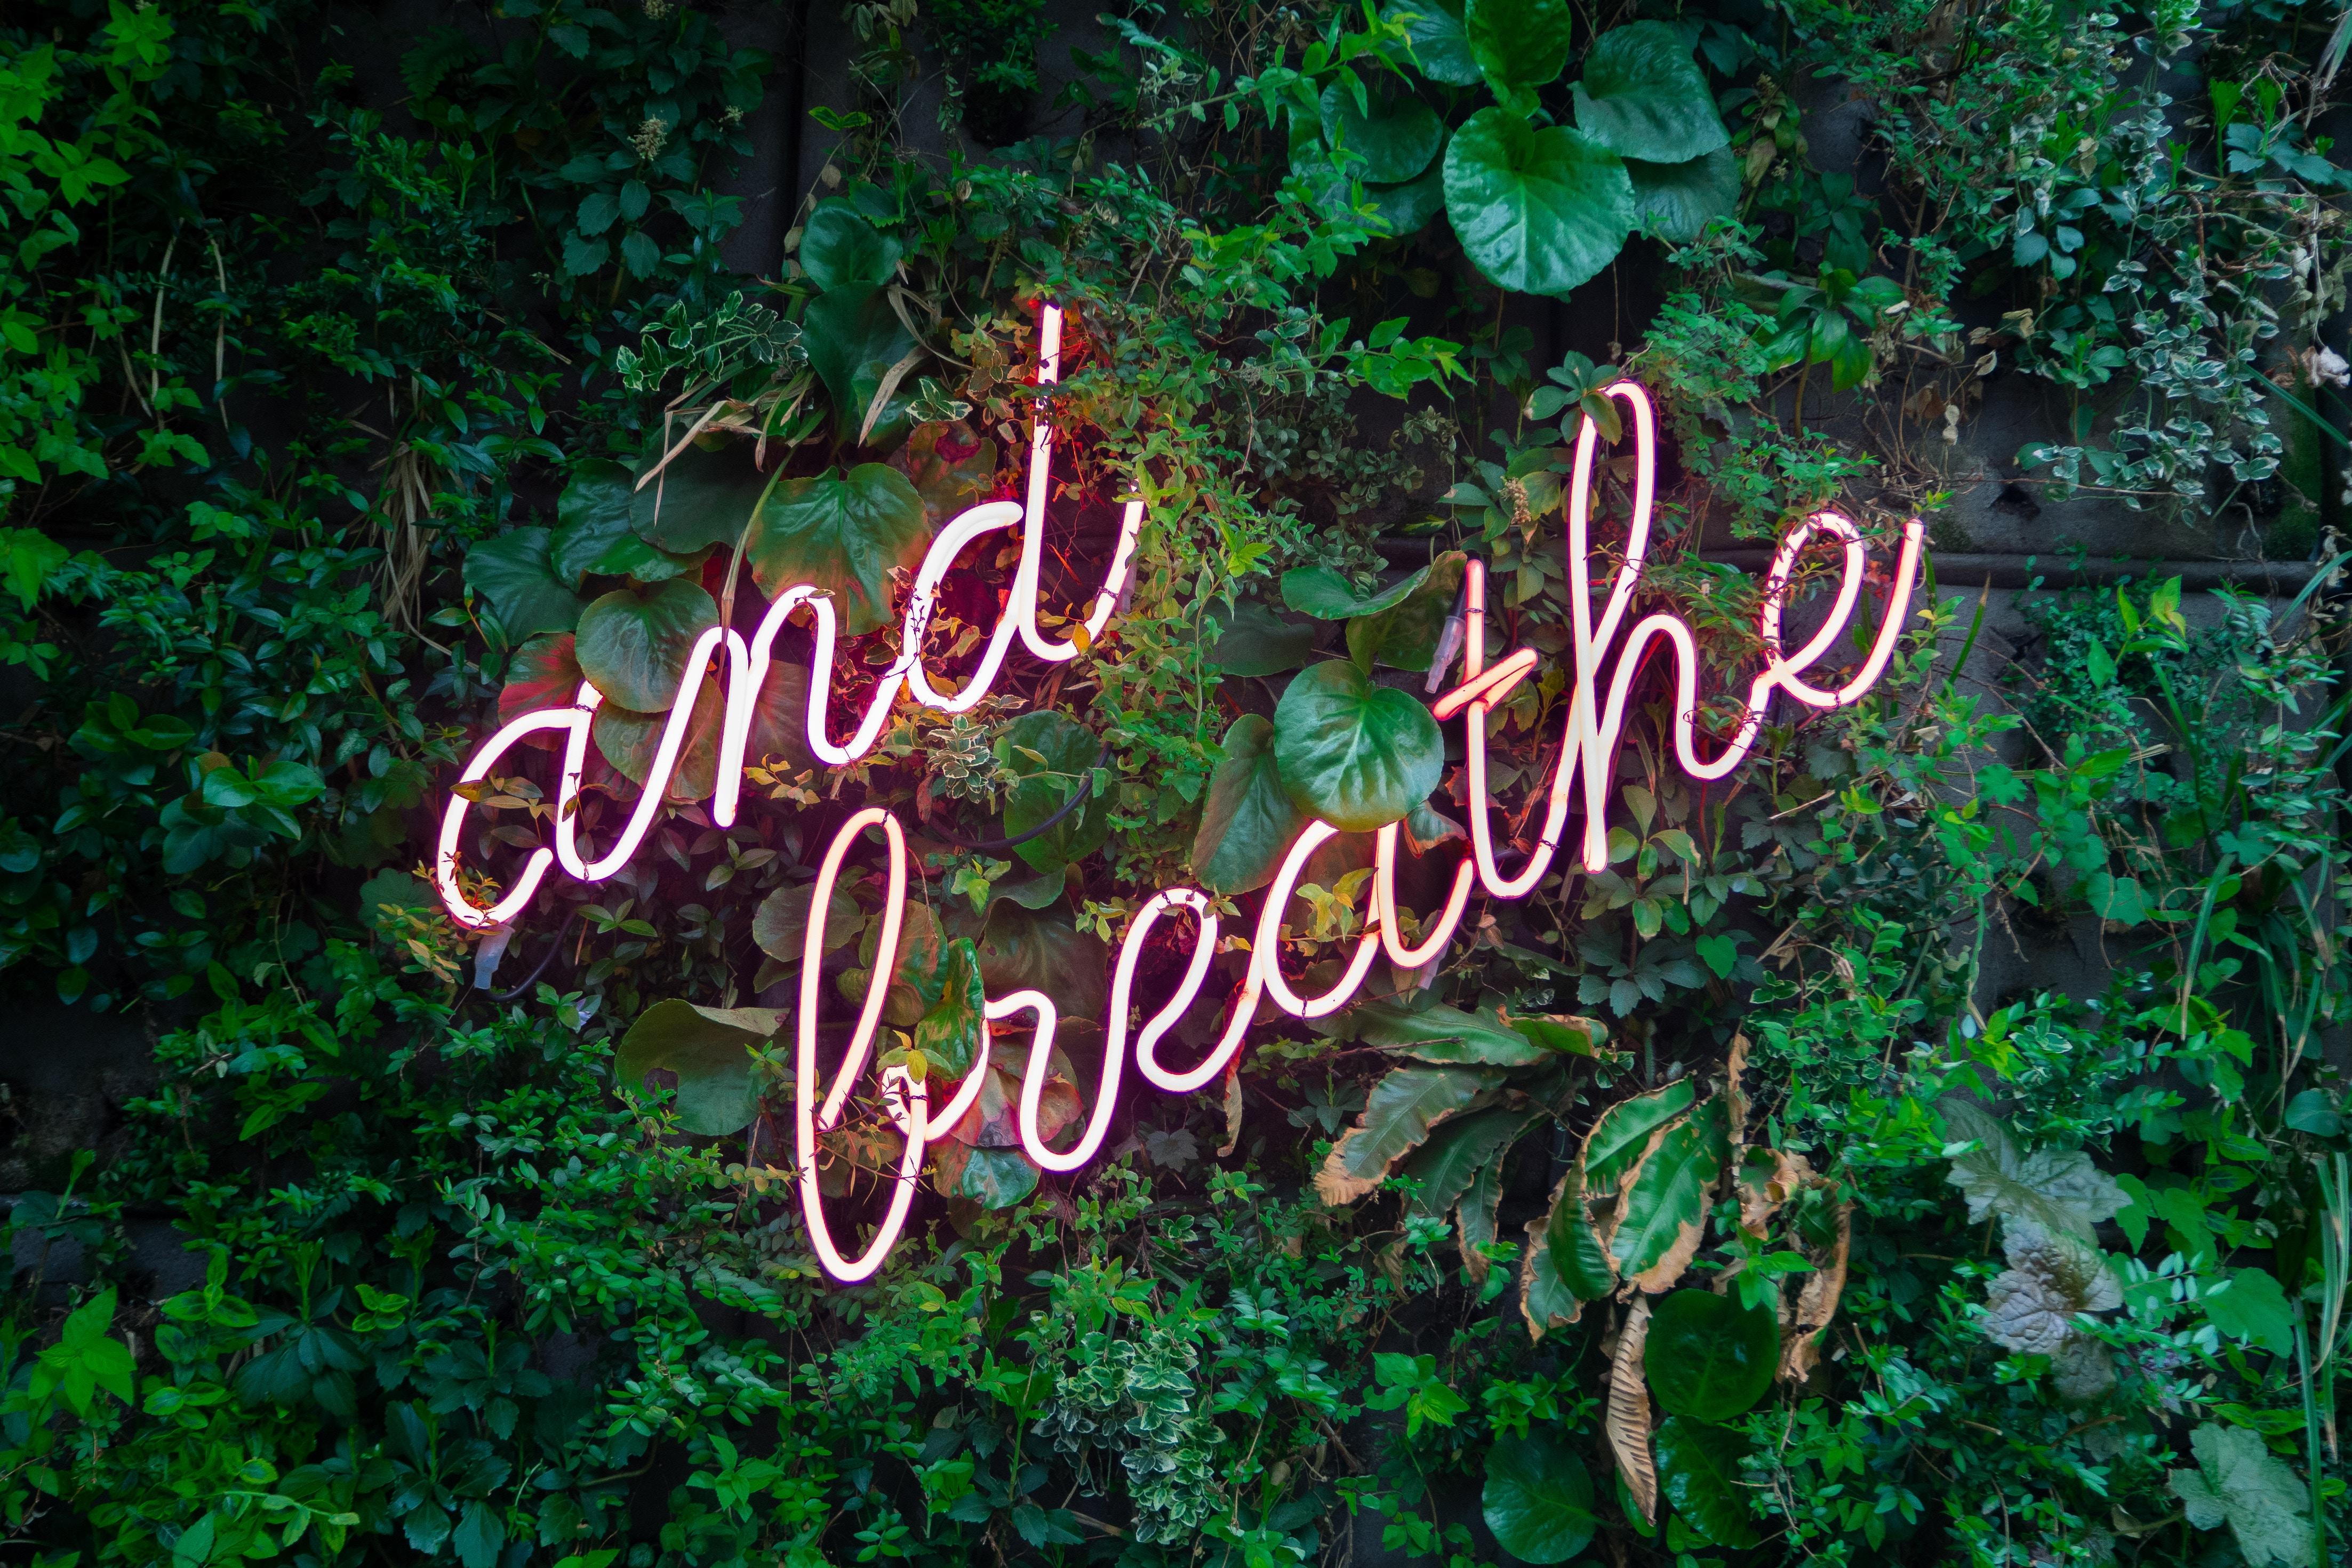 Breathe max-van-den-oetelaar-646474-unsplash